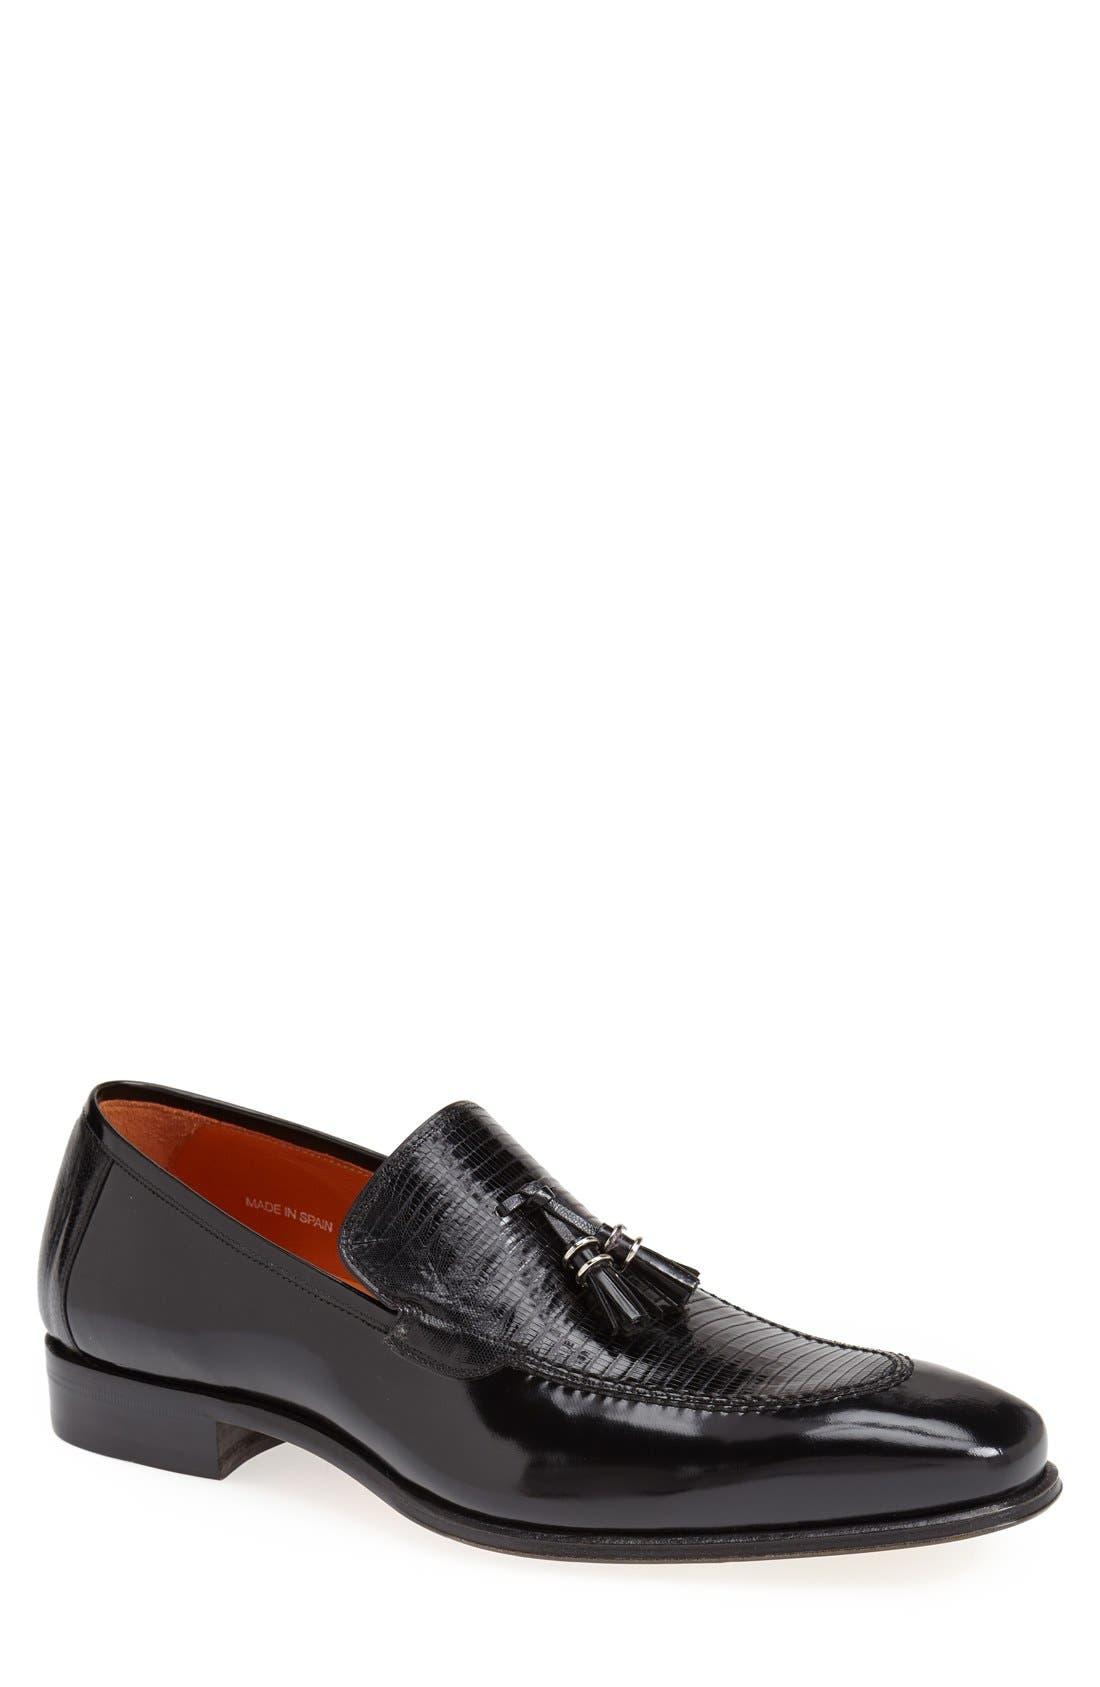 'Obrador' Lizard Leather Tassel Loafer,                             Main thumbnail 1, color,                             Black